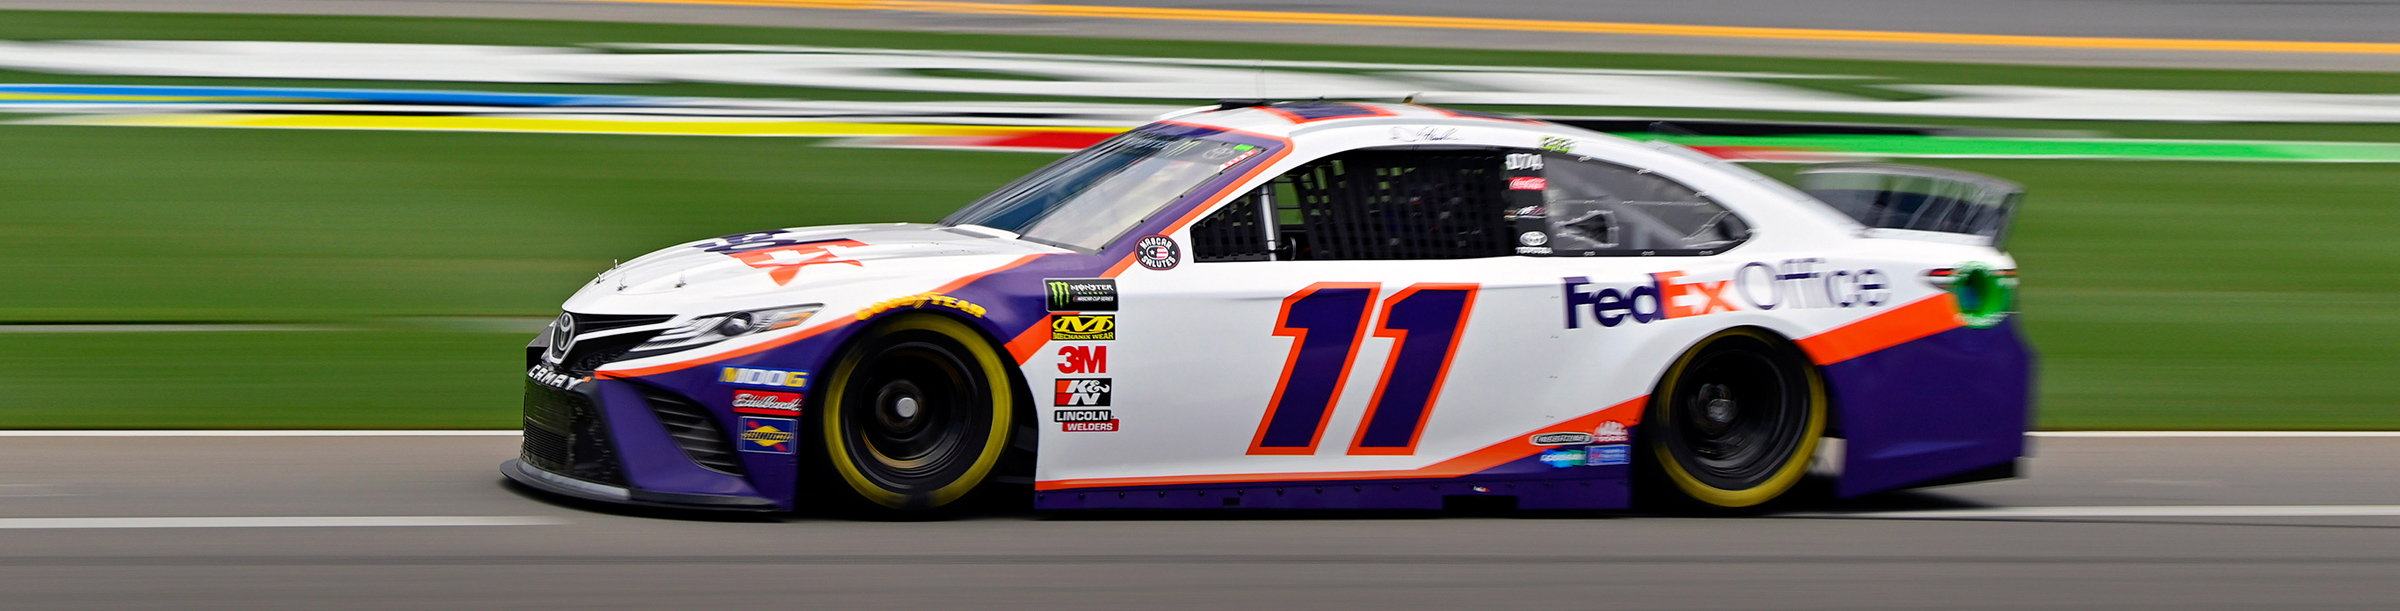 FedEx Racing